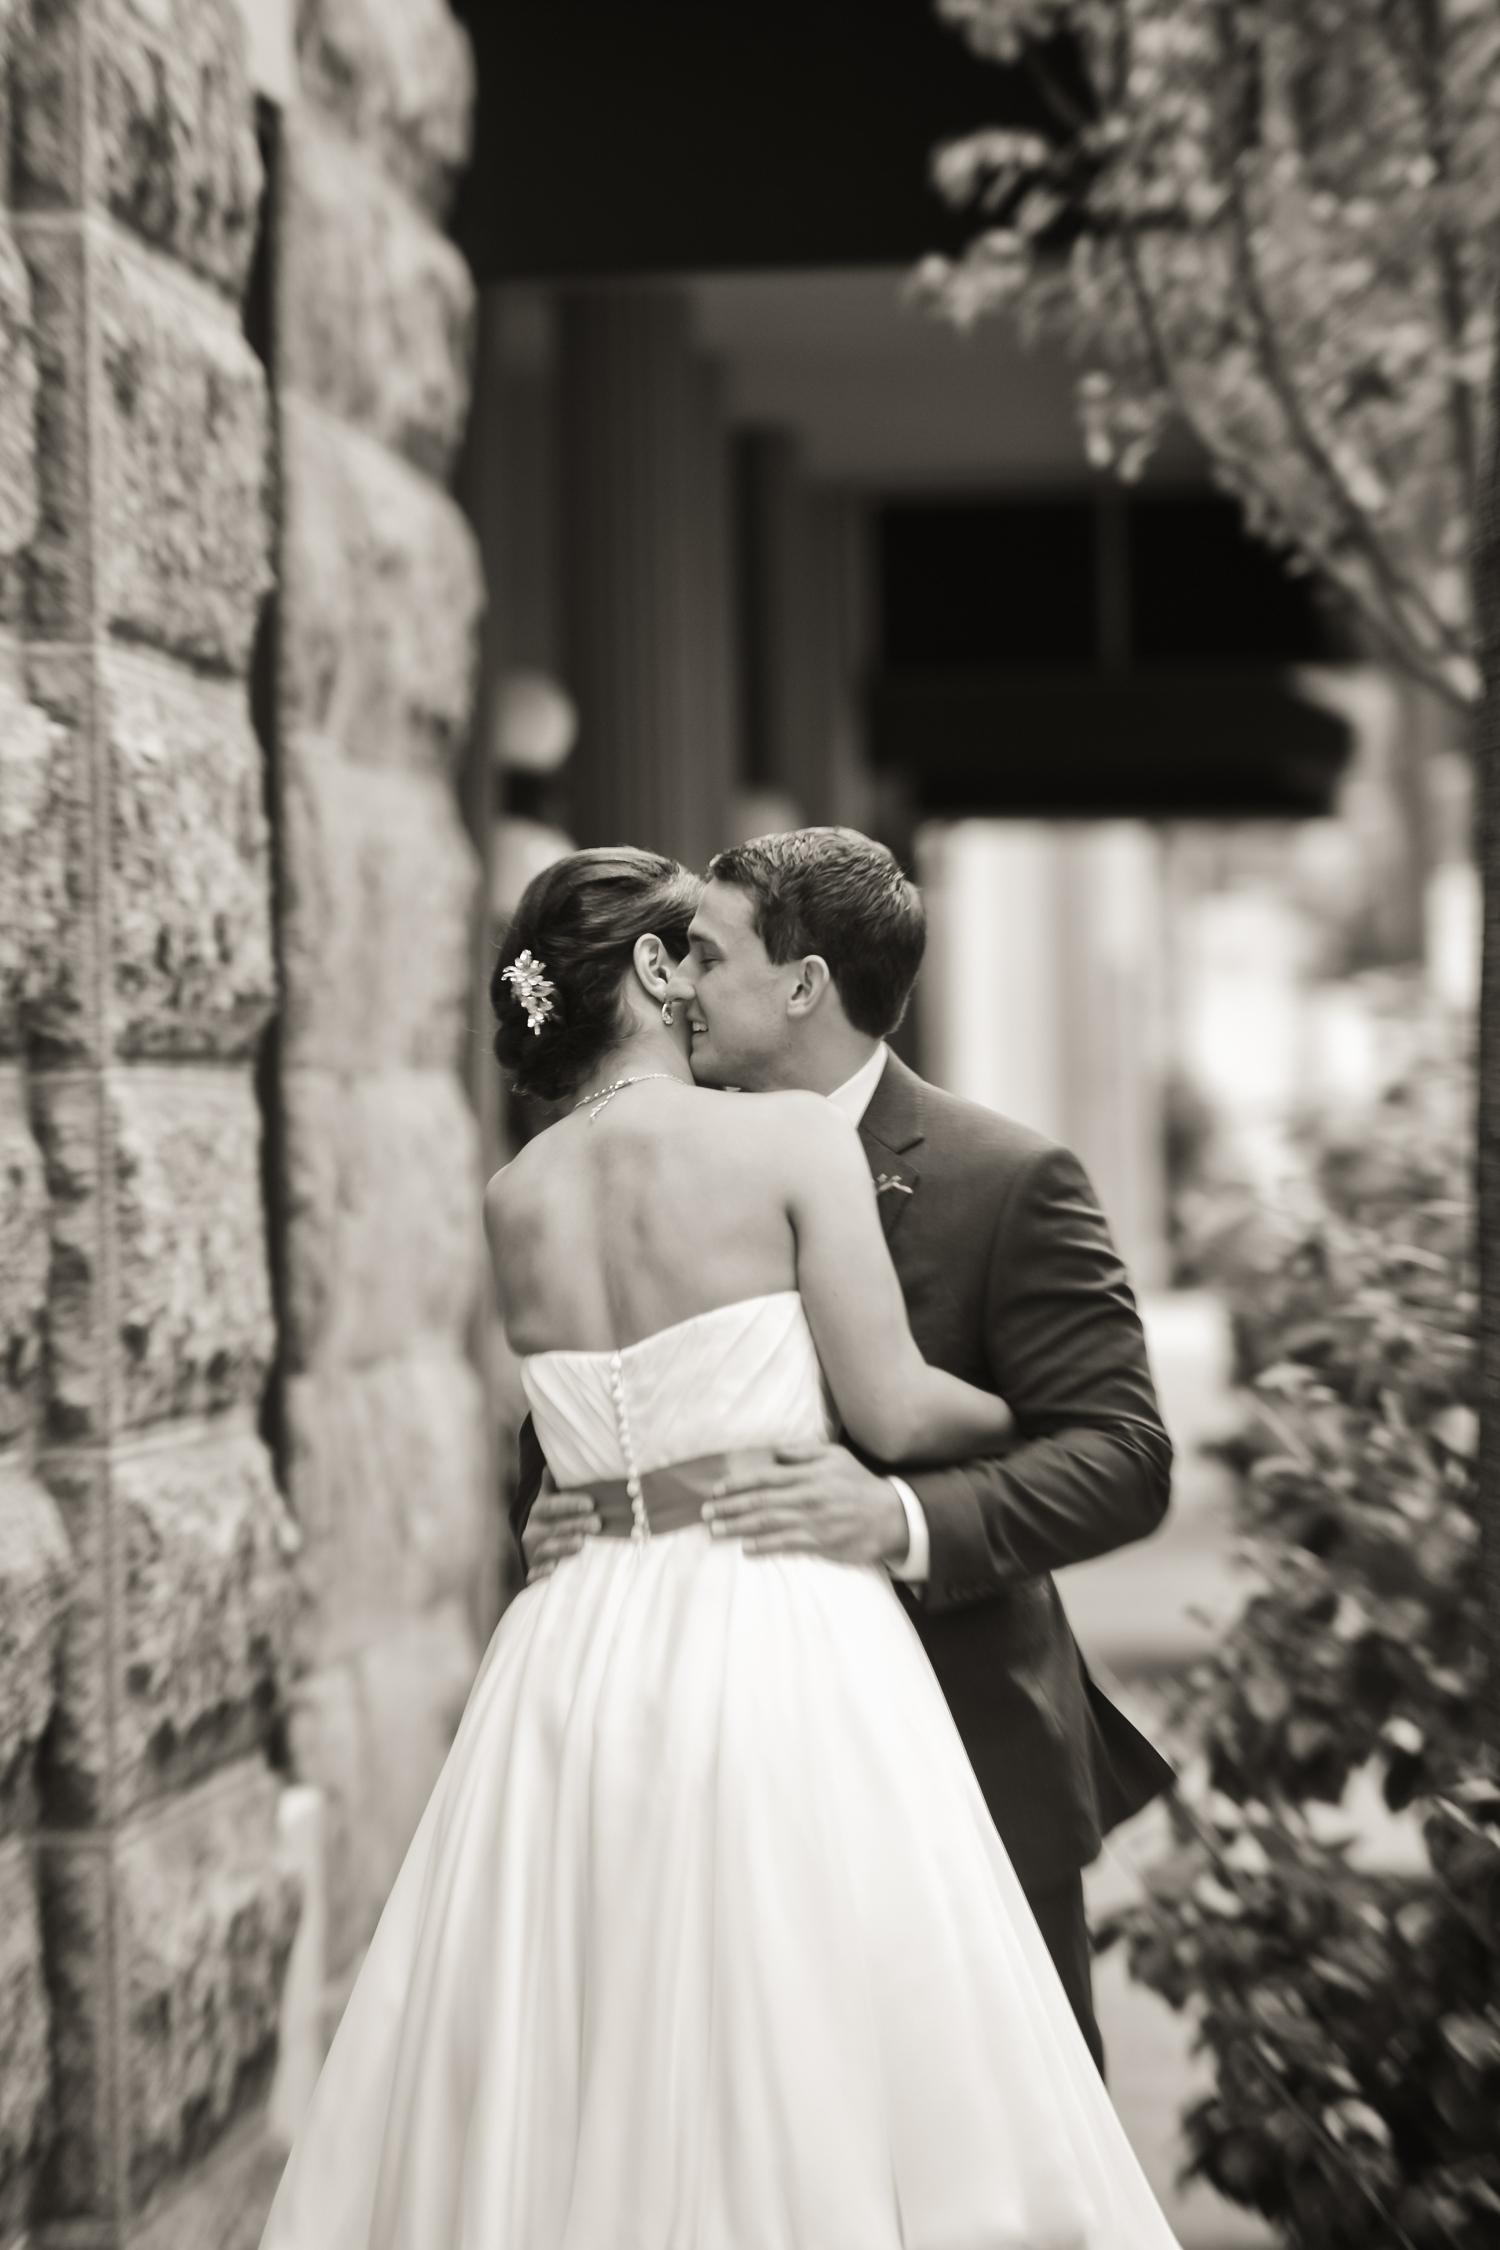 new_orleans_wedding_photographer_0013.jpg